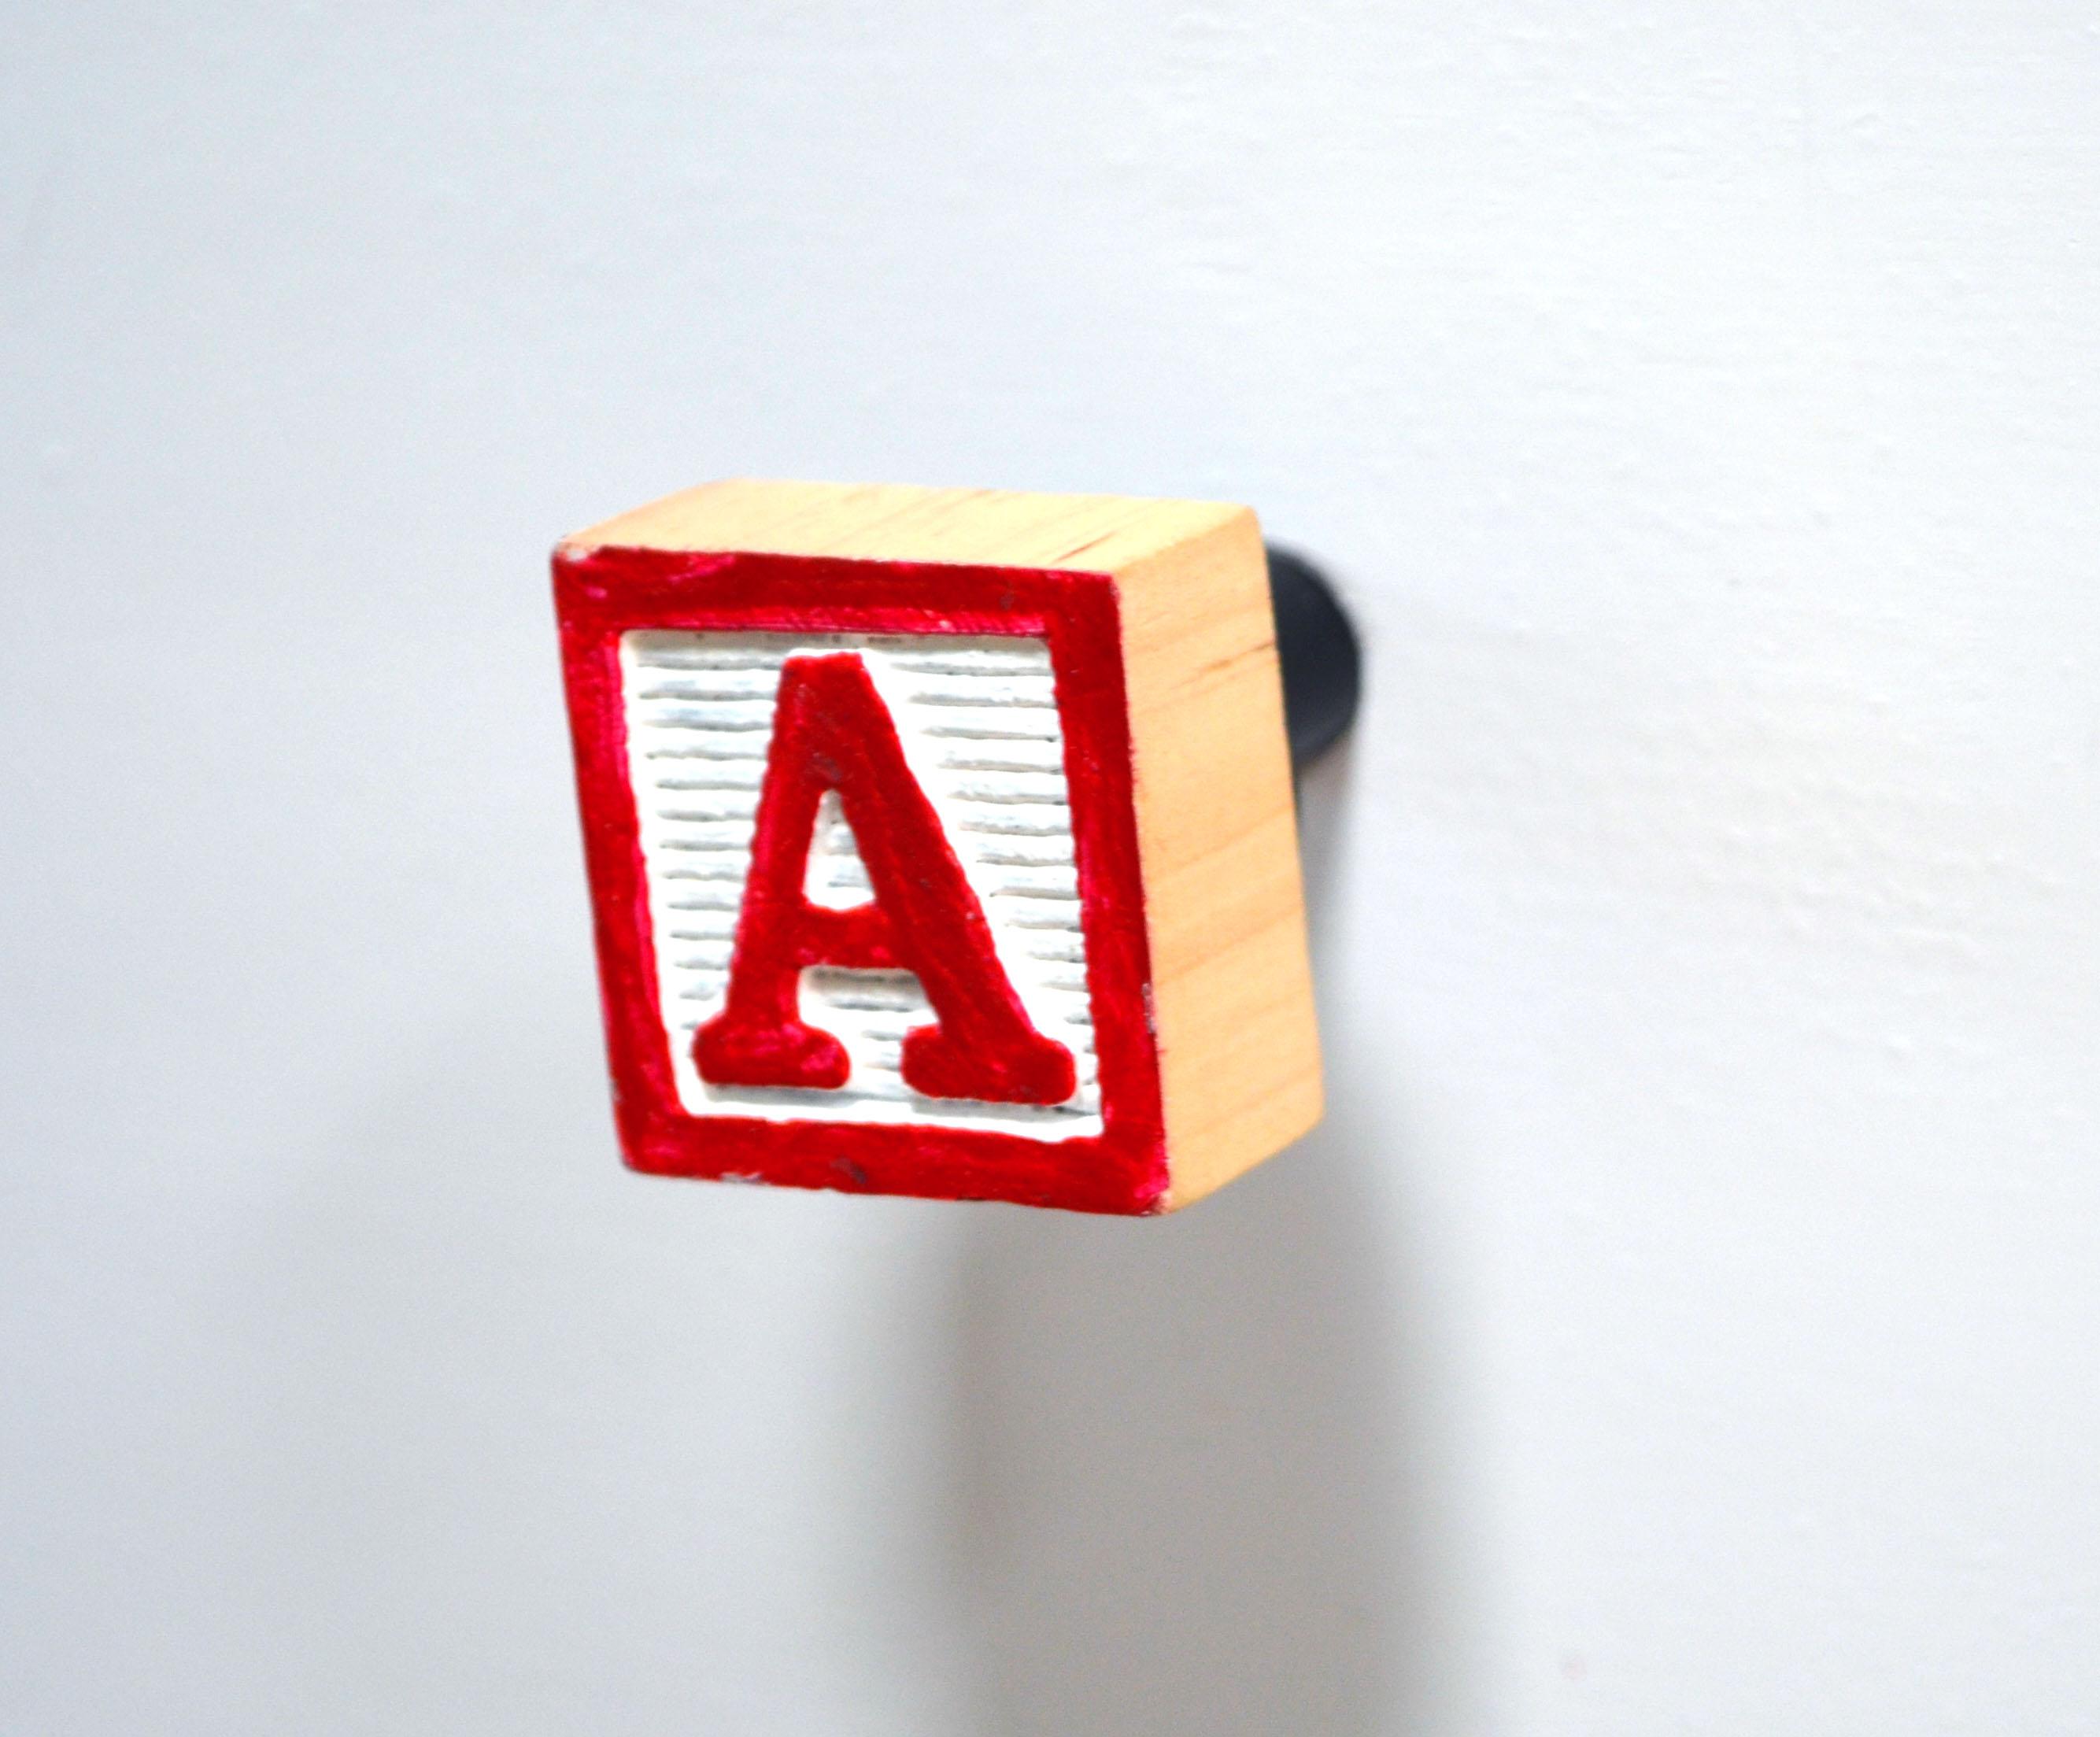 A block knob